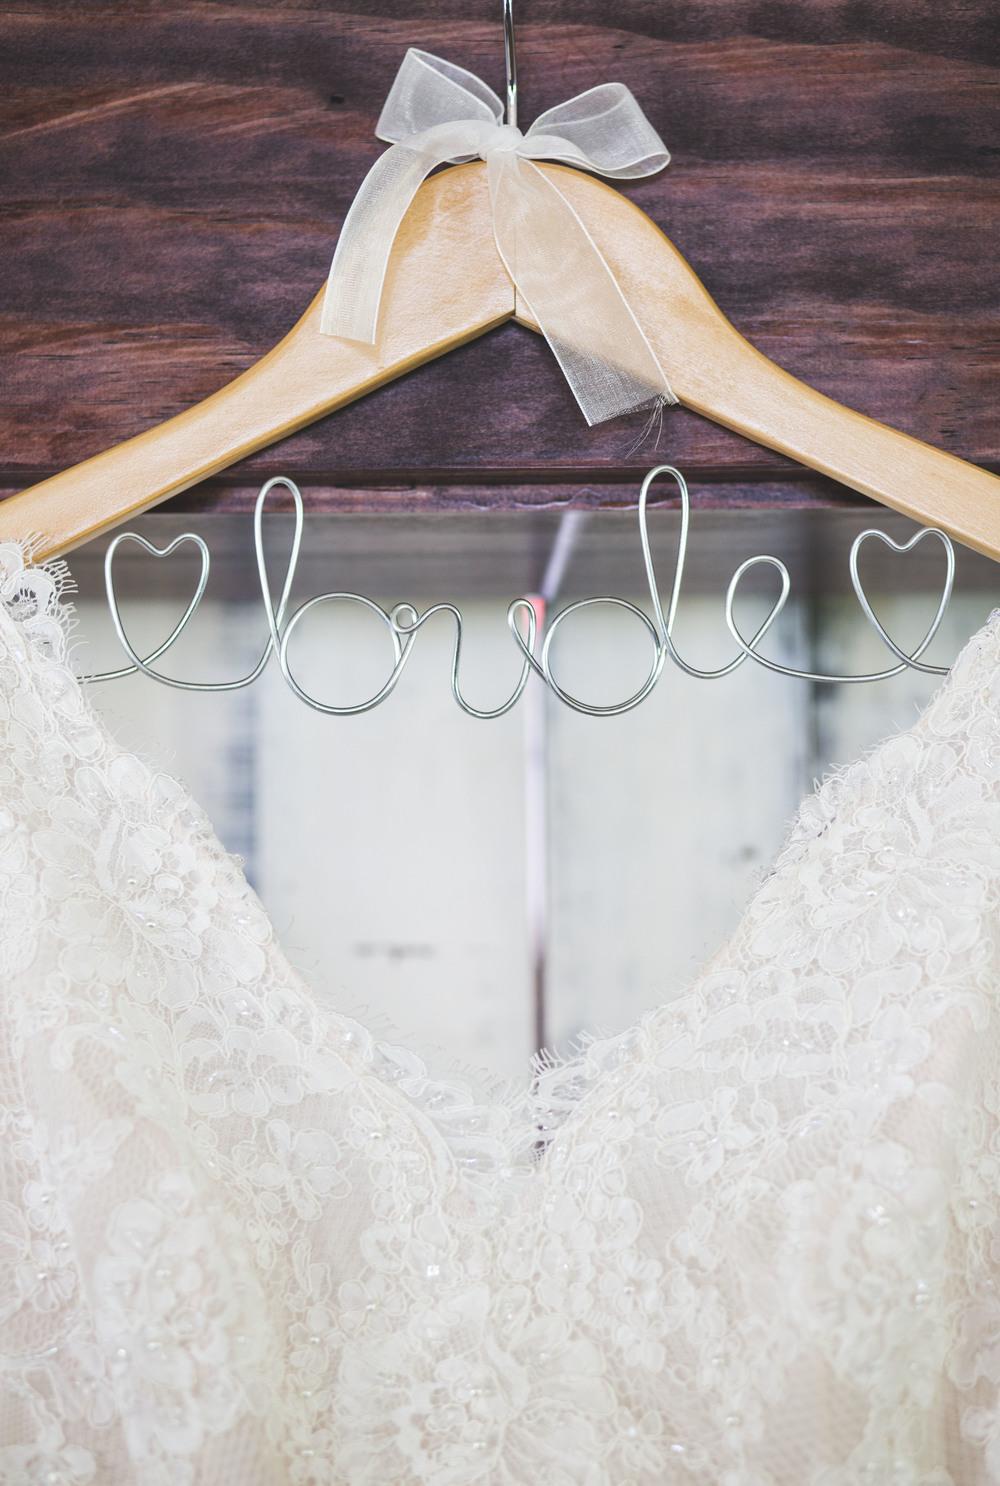 ATGI_Cory & Jackie Wedding_2S8A1218.jpg